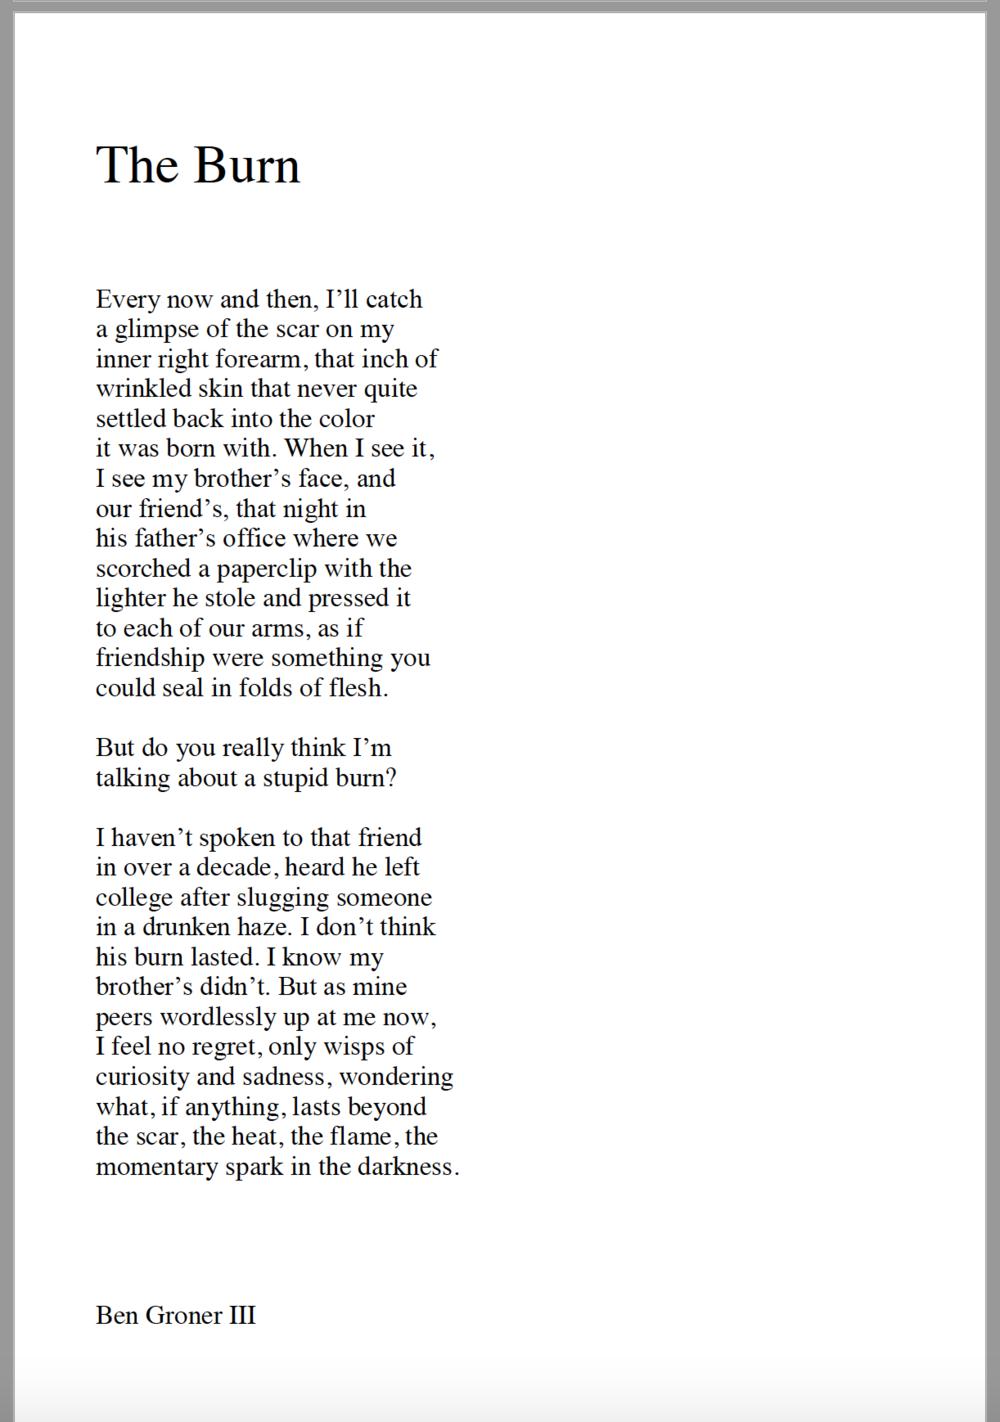 The Burn PDF screenshot 2.png